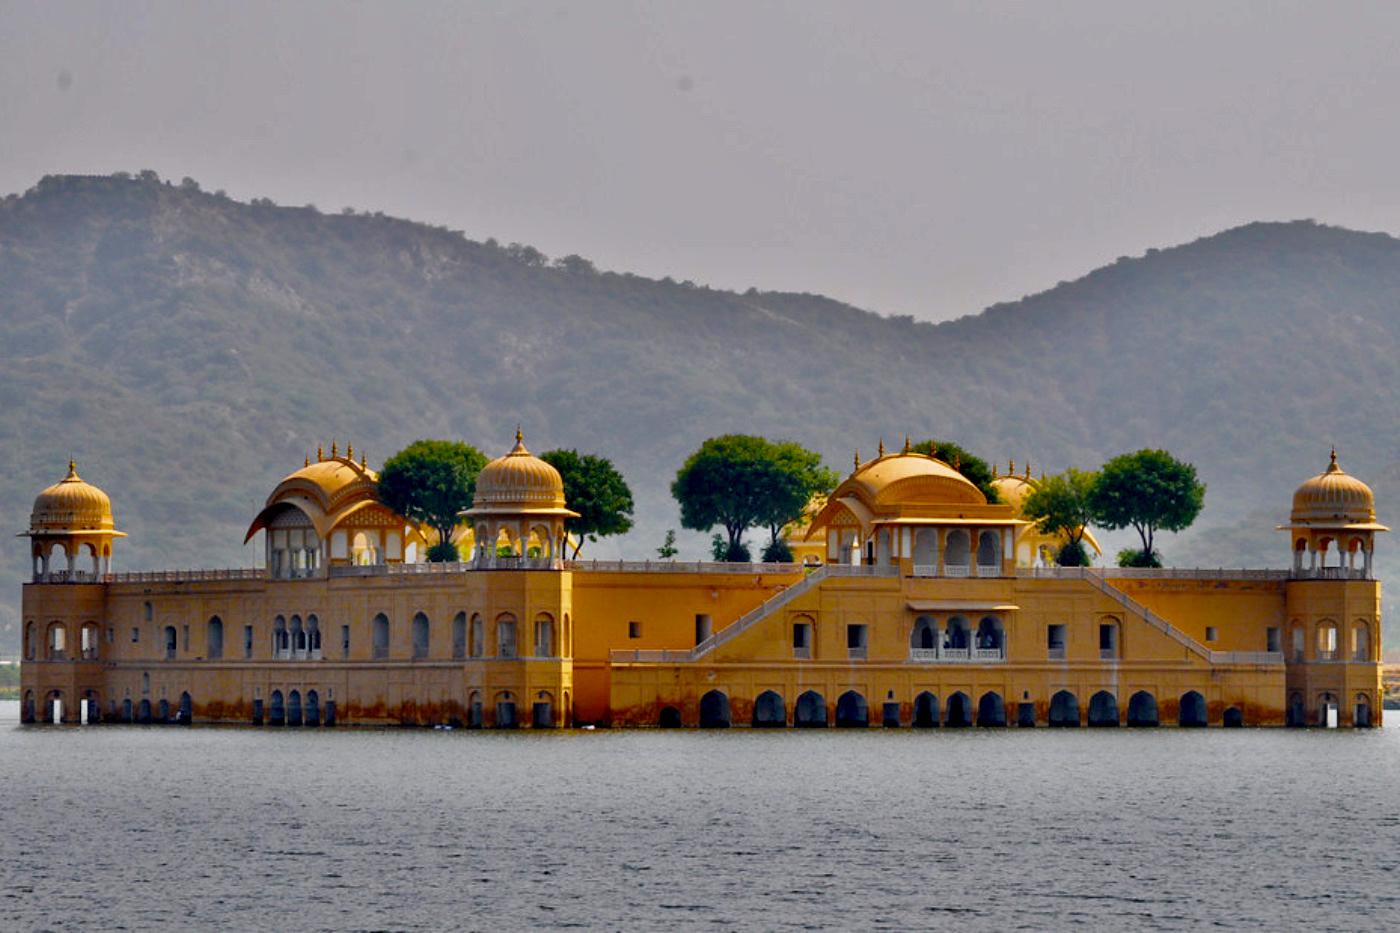 Jal Mahal Palace Jaipur Rajasthan India